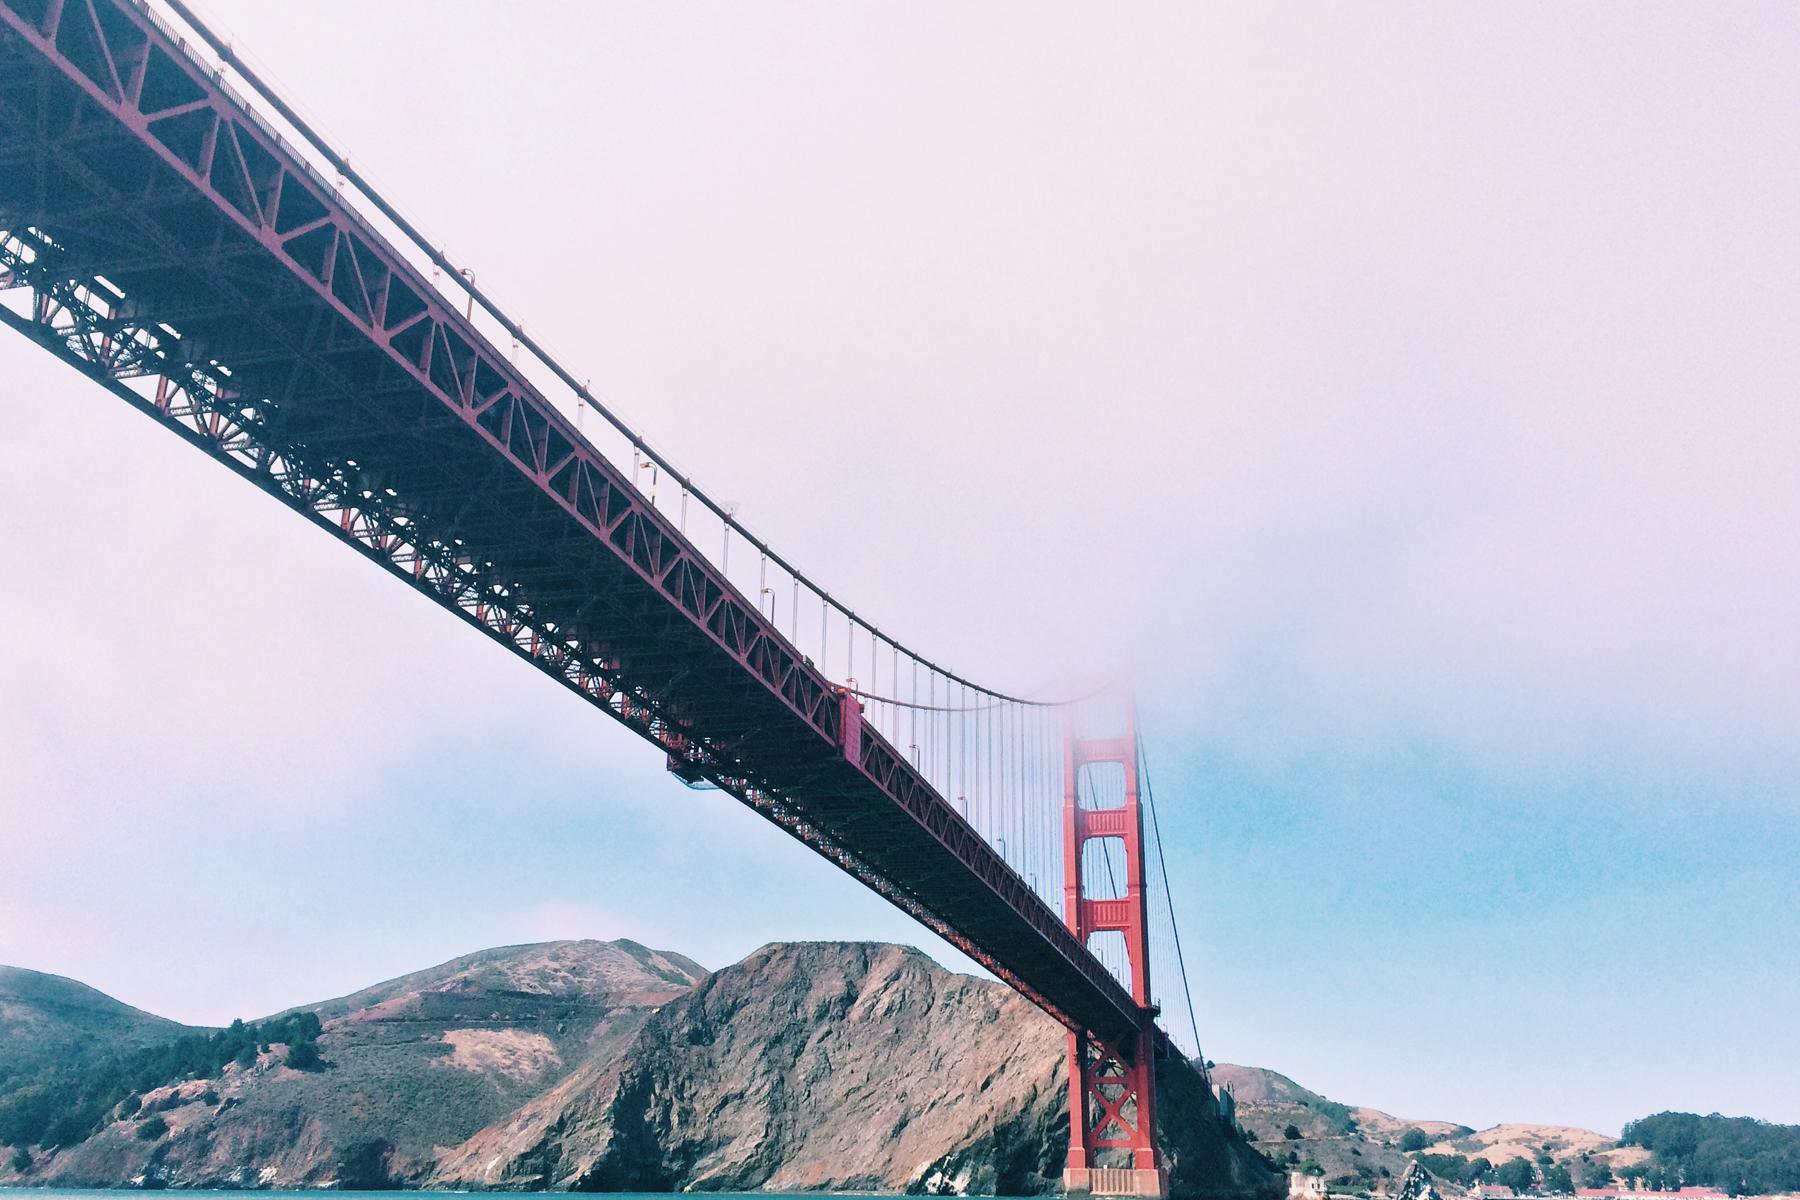 LYRASIS at ALA in San Francisco